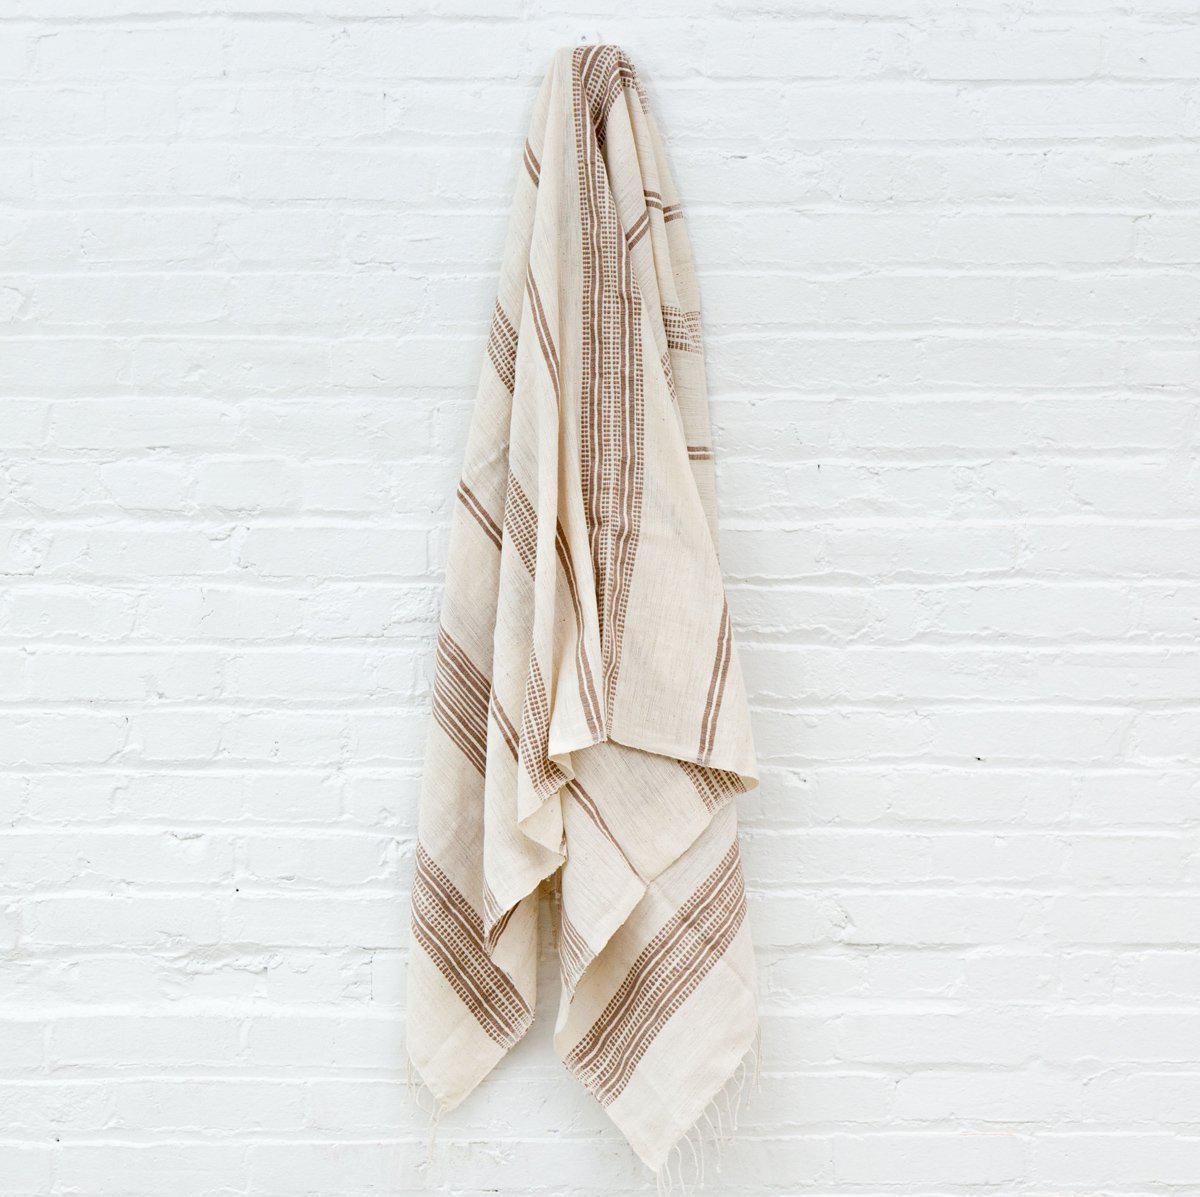 Biege Striped Cotton Bath Towel Beige In 2019 Eco Friendly